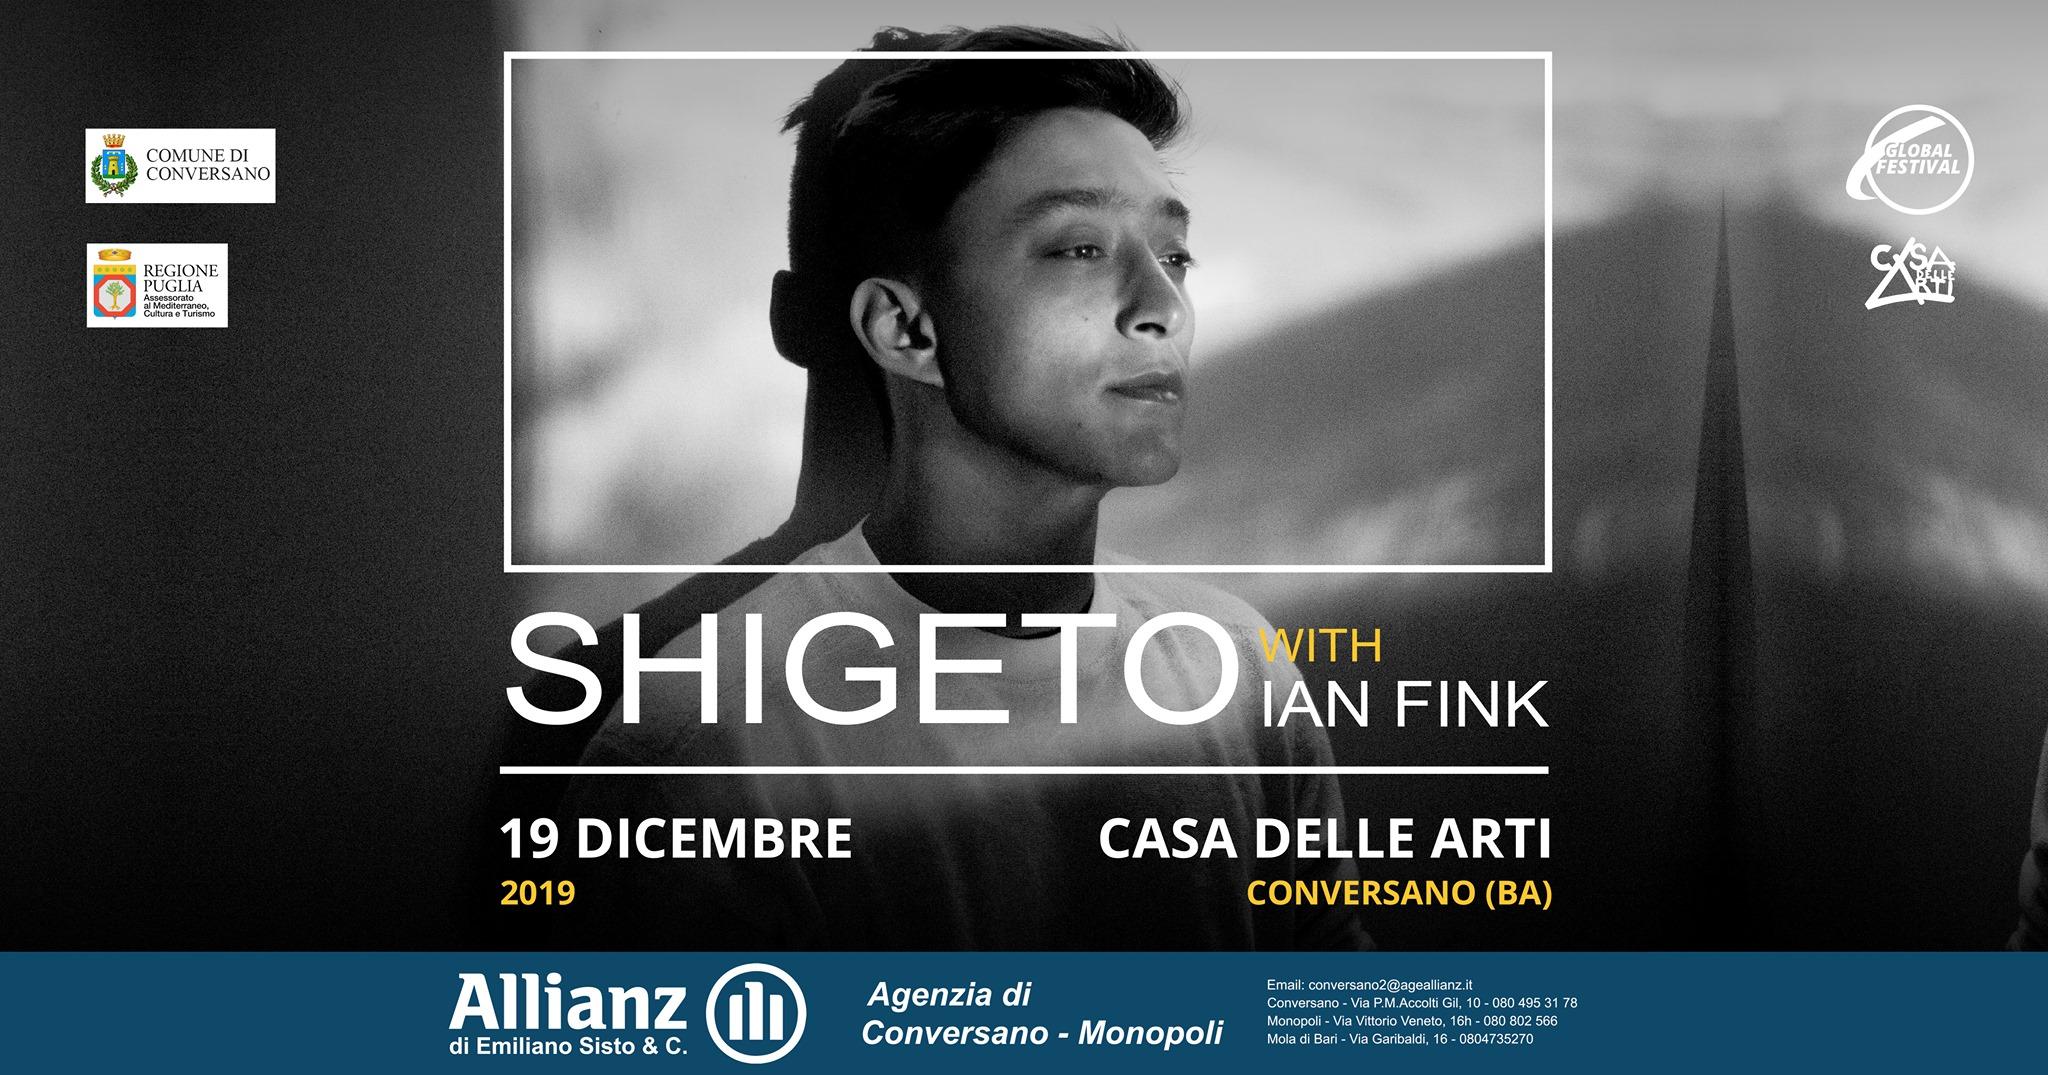 Shigeto (live duo with Ian Fink)